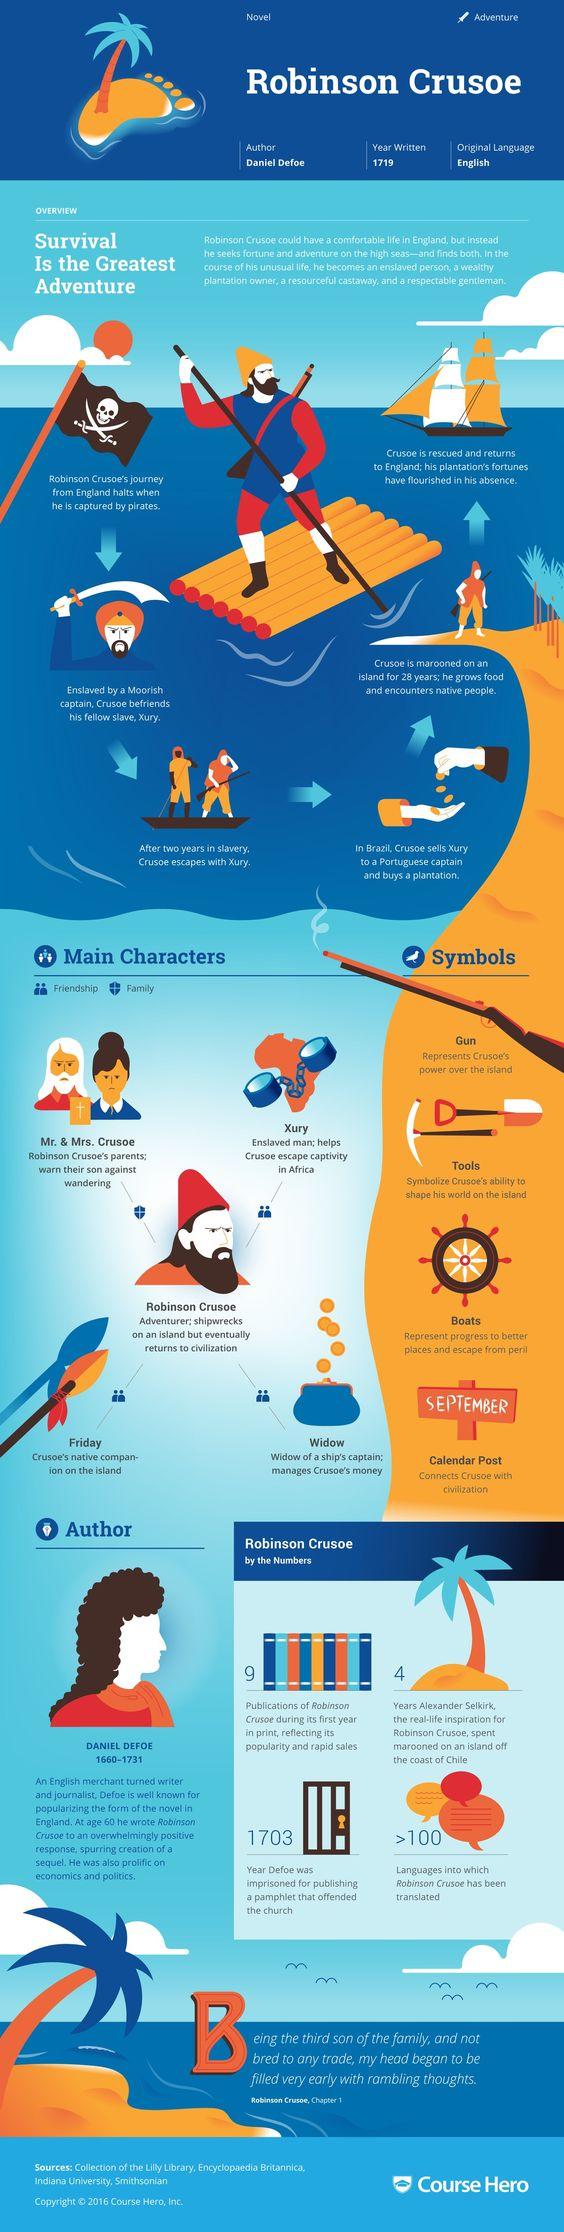 Robinson Crusoe Infographic | Course Hero